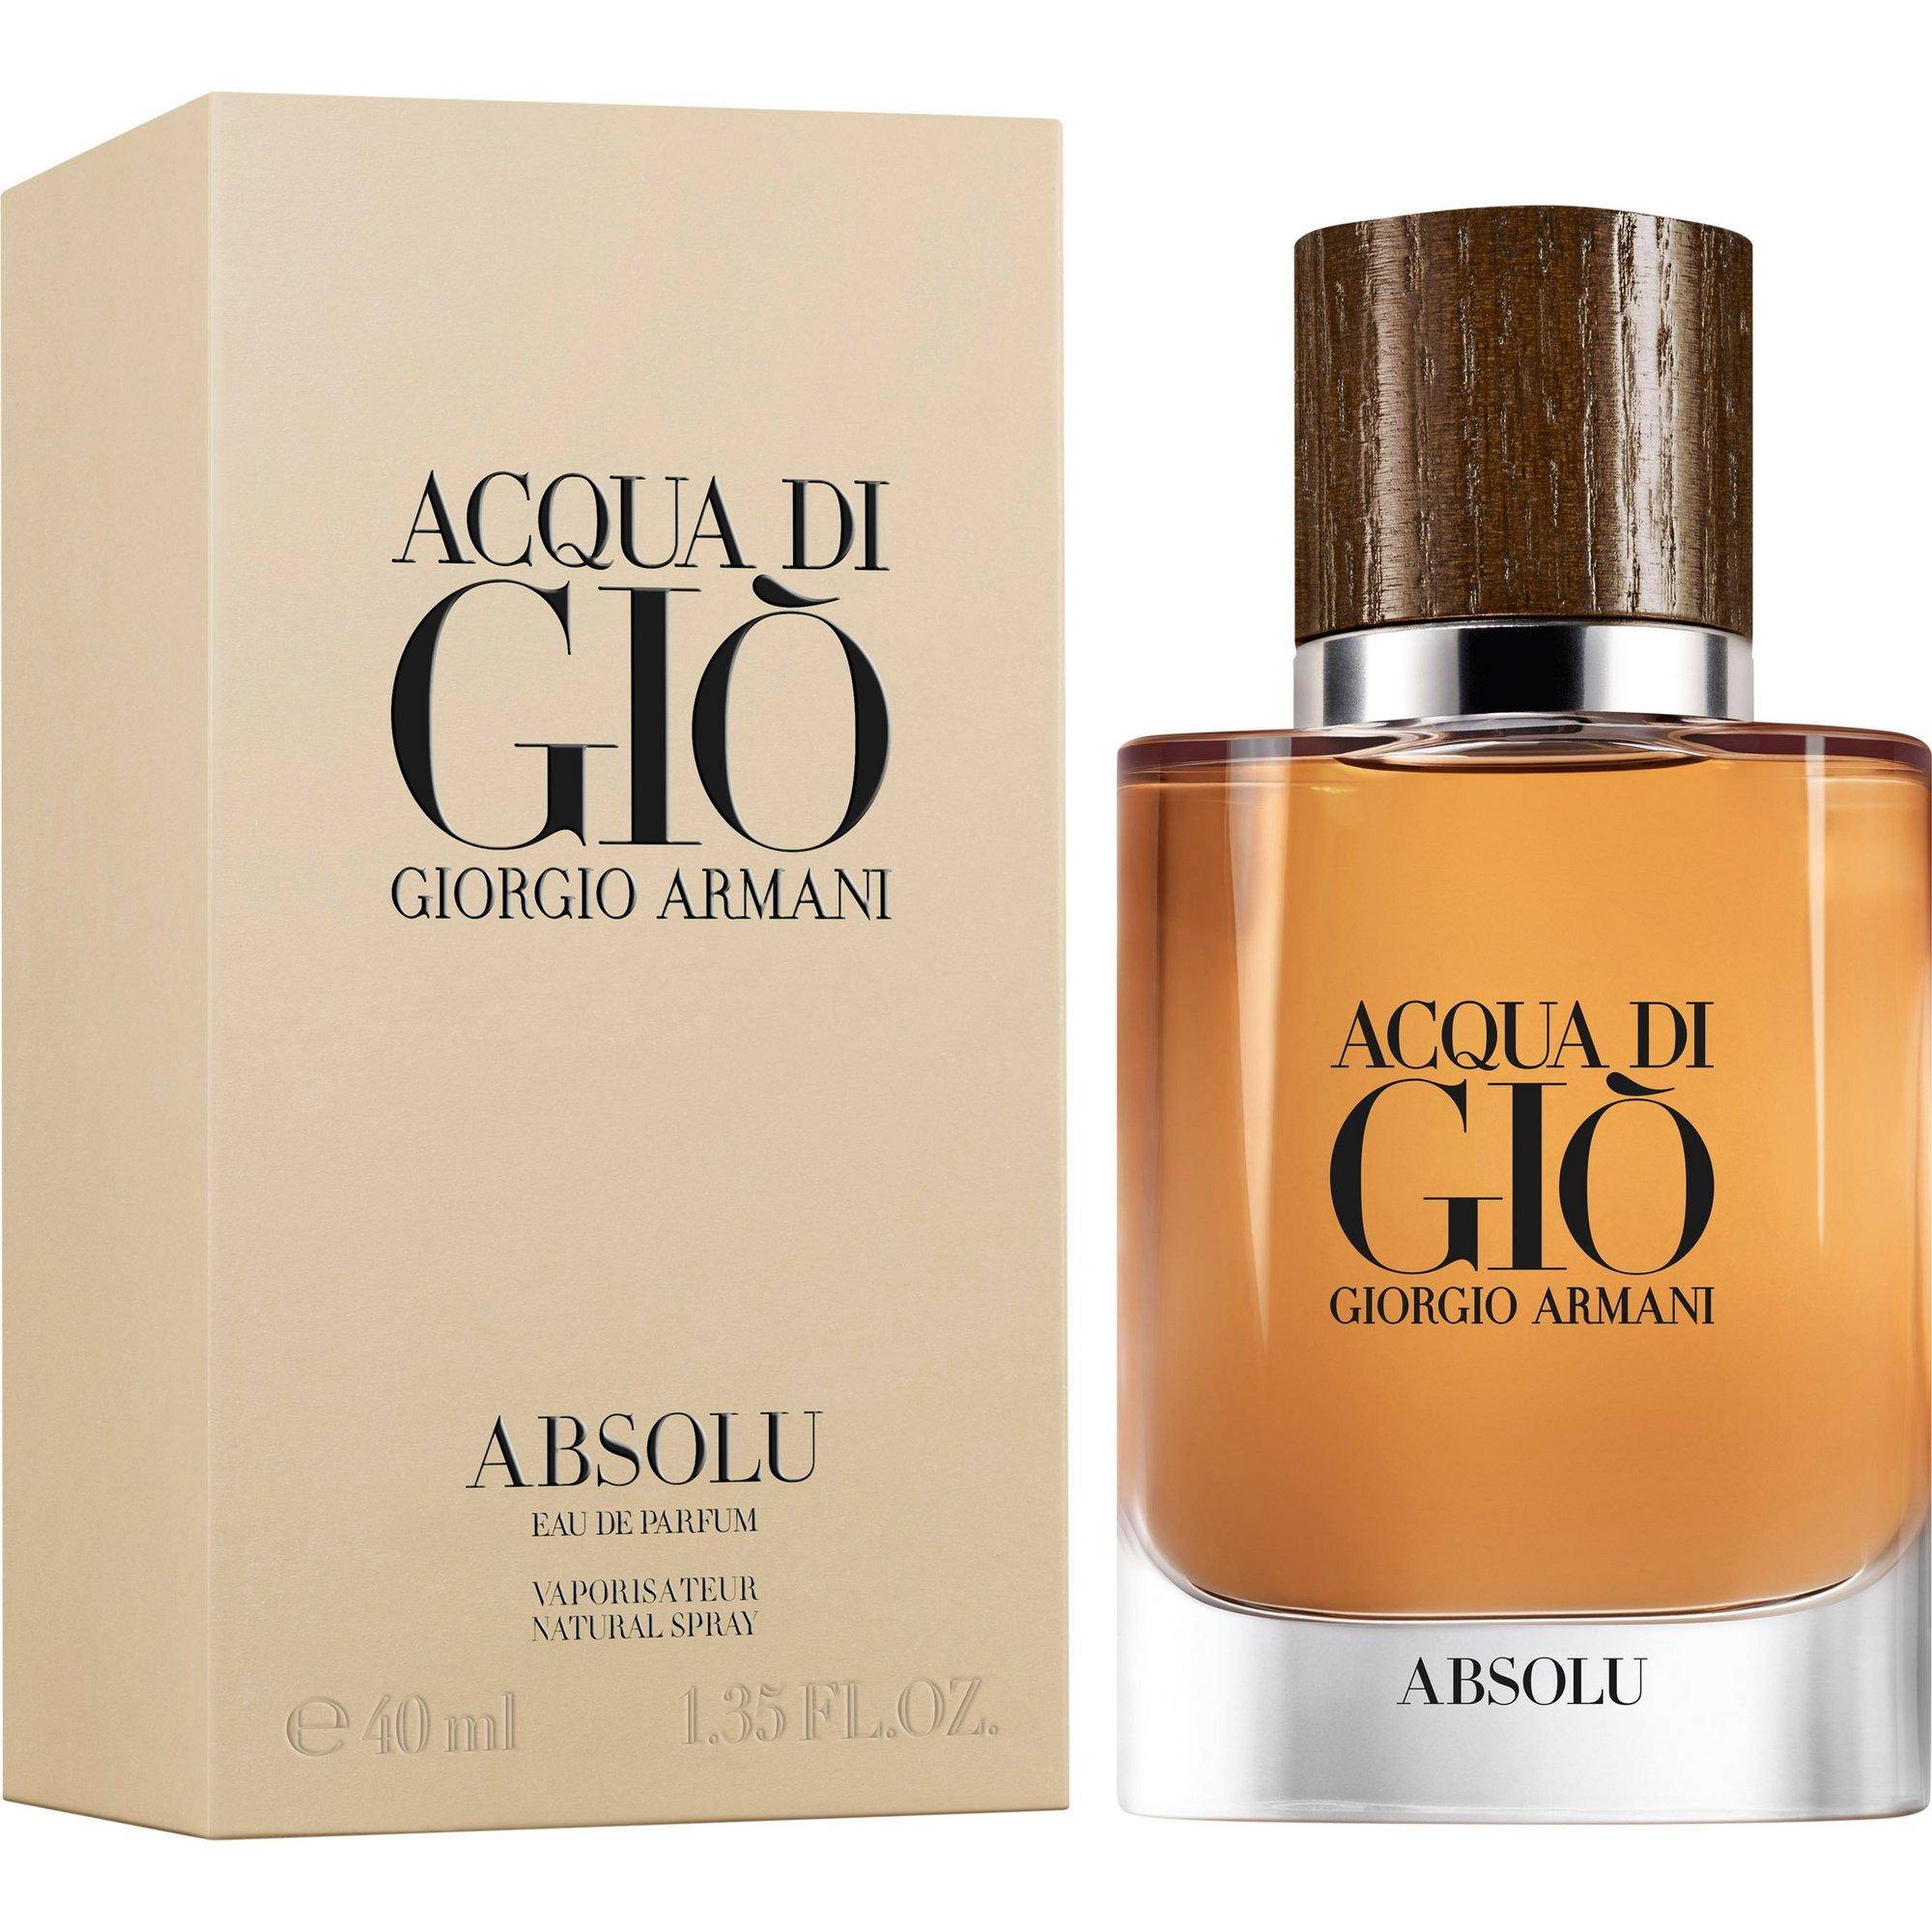 Image of Giorgio Armani Acqua Di Gio Absolu 40ml Eau De Parfum